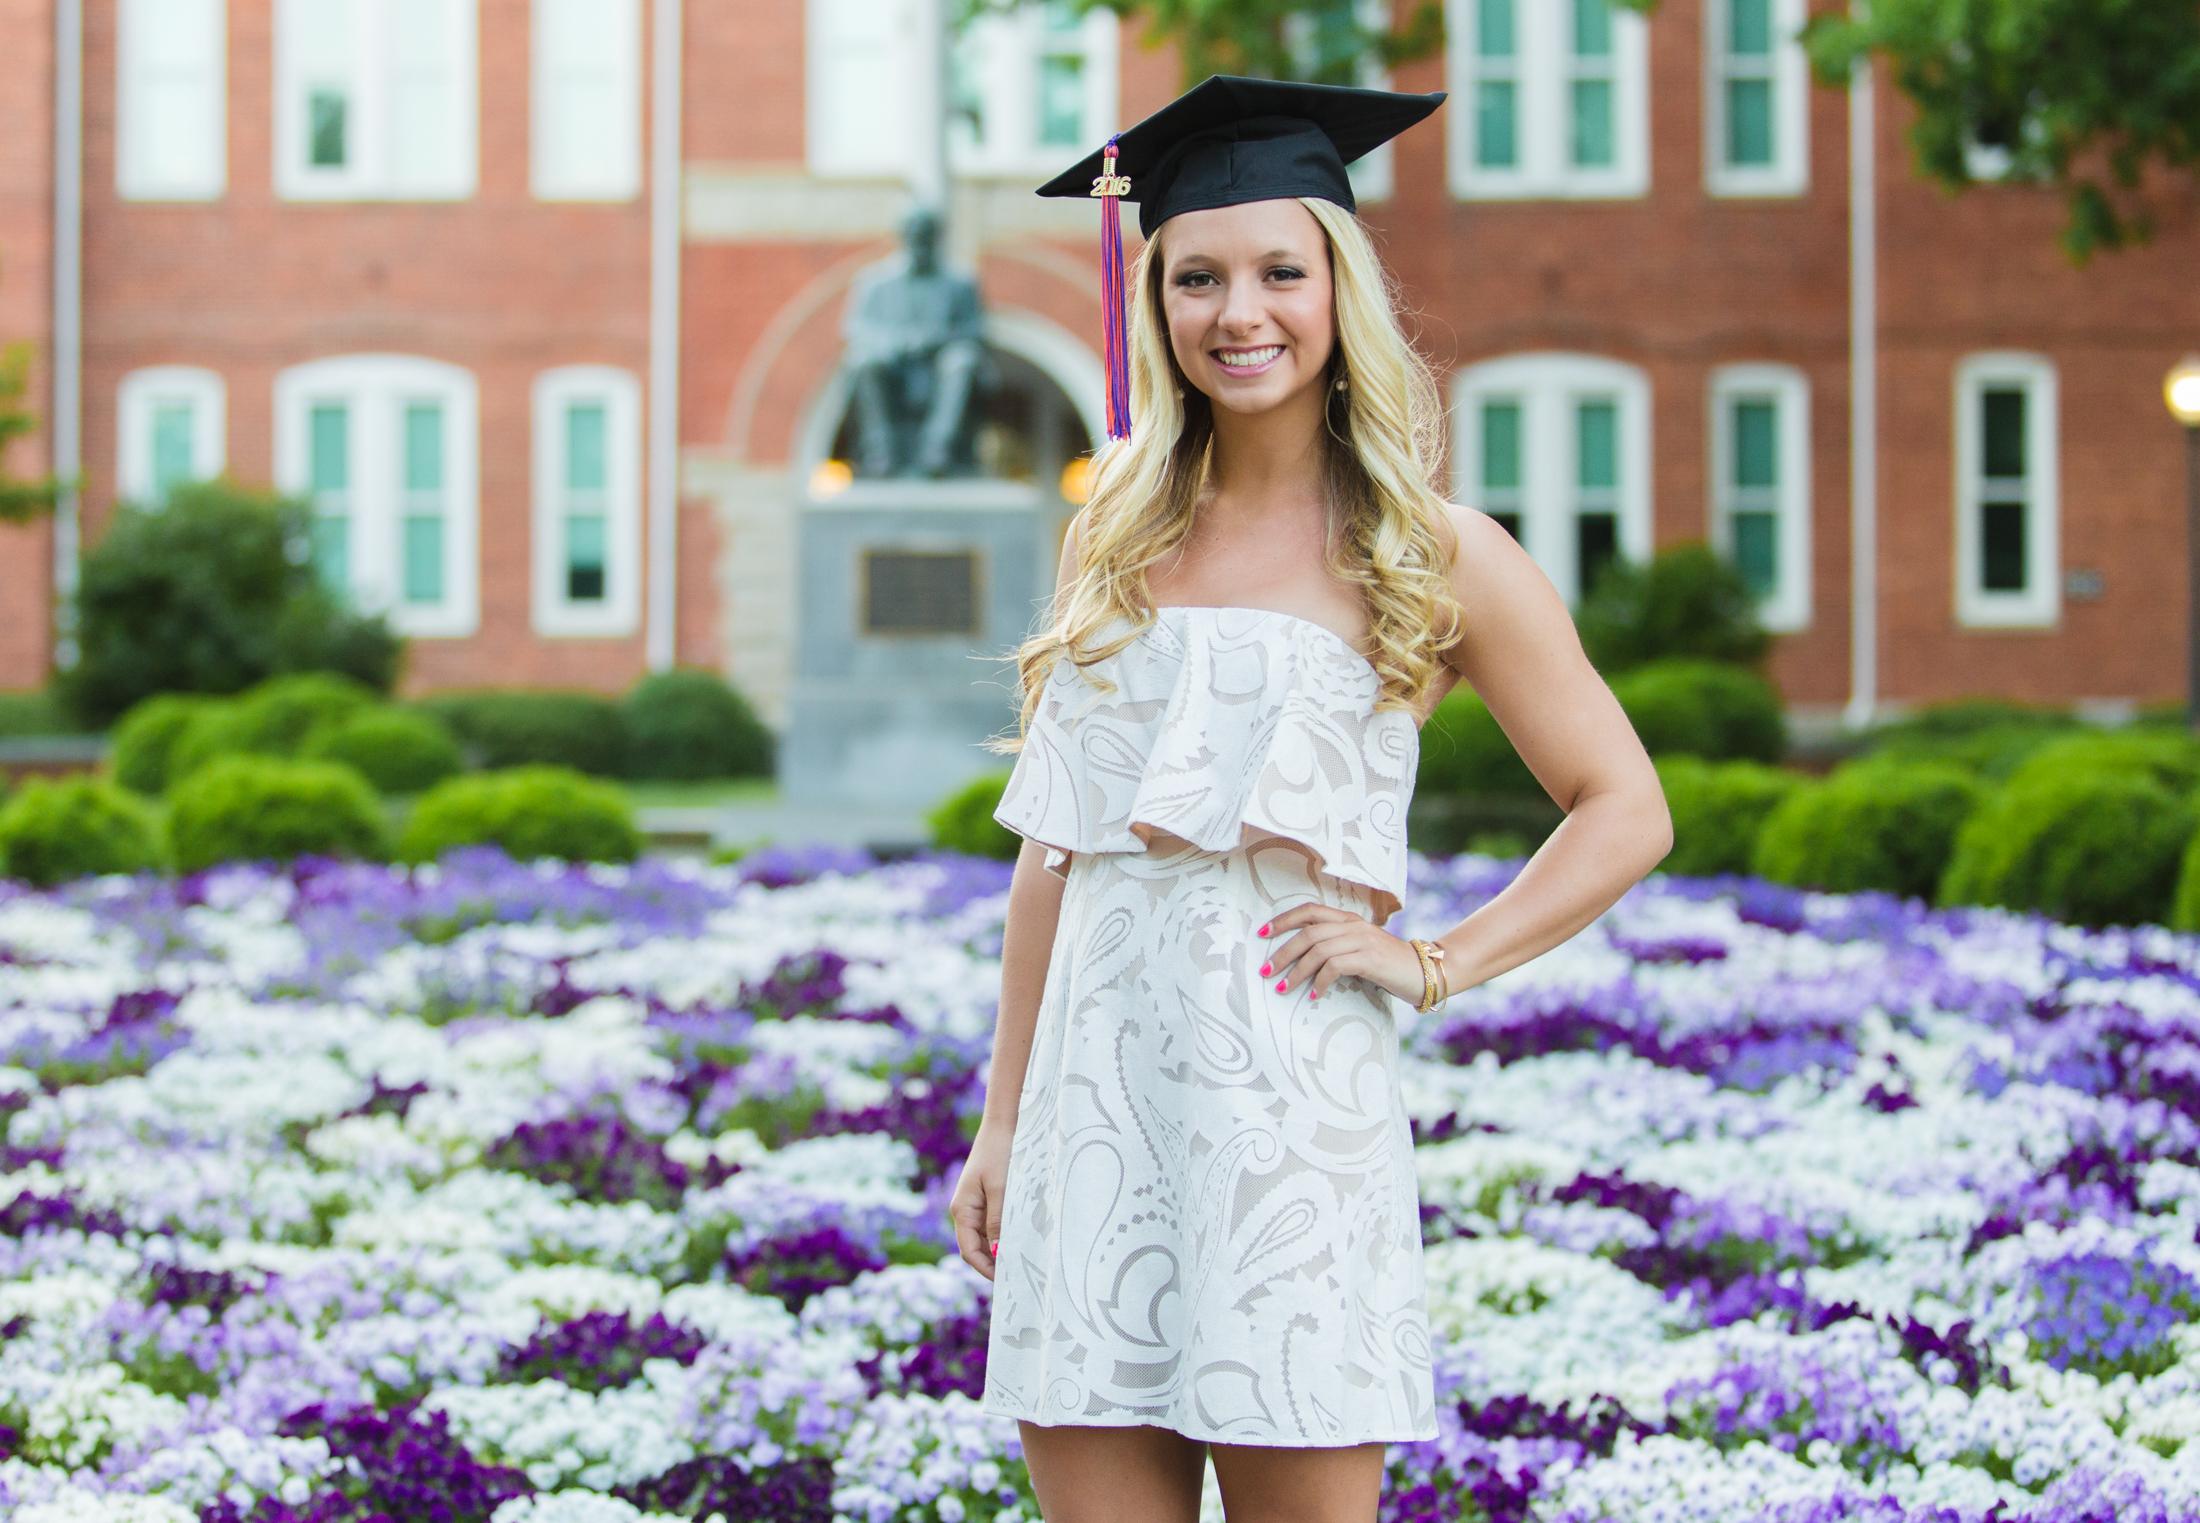 Caroline Potter-Clemson University_DP_2016-7899.jpg